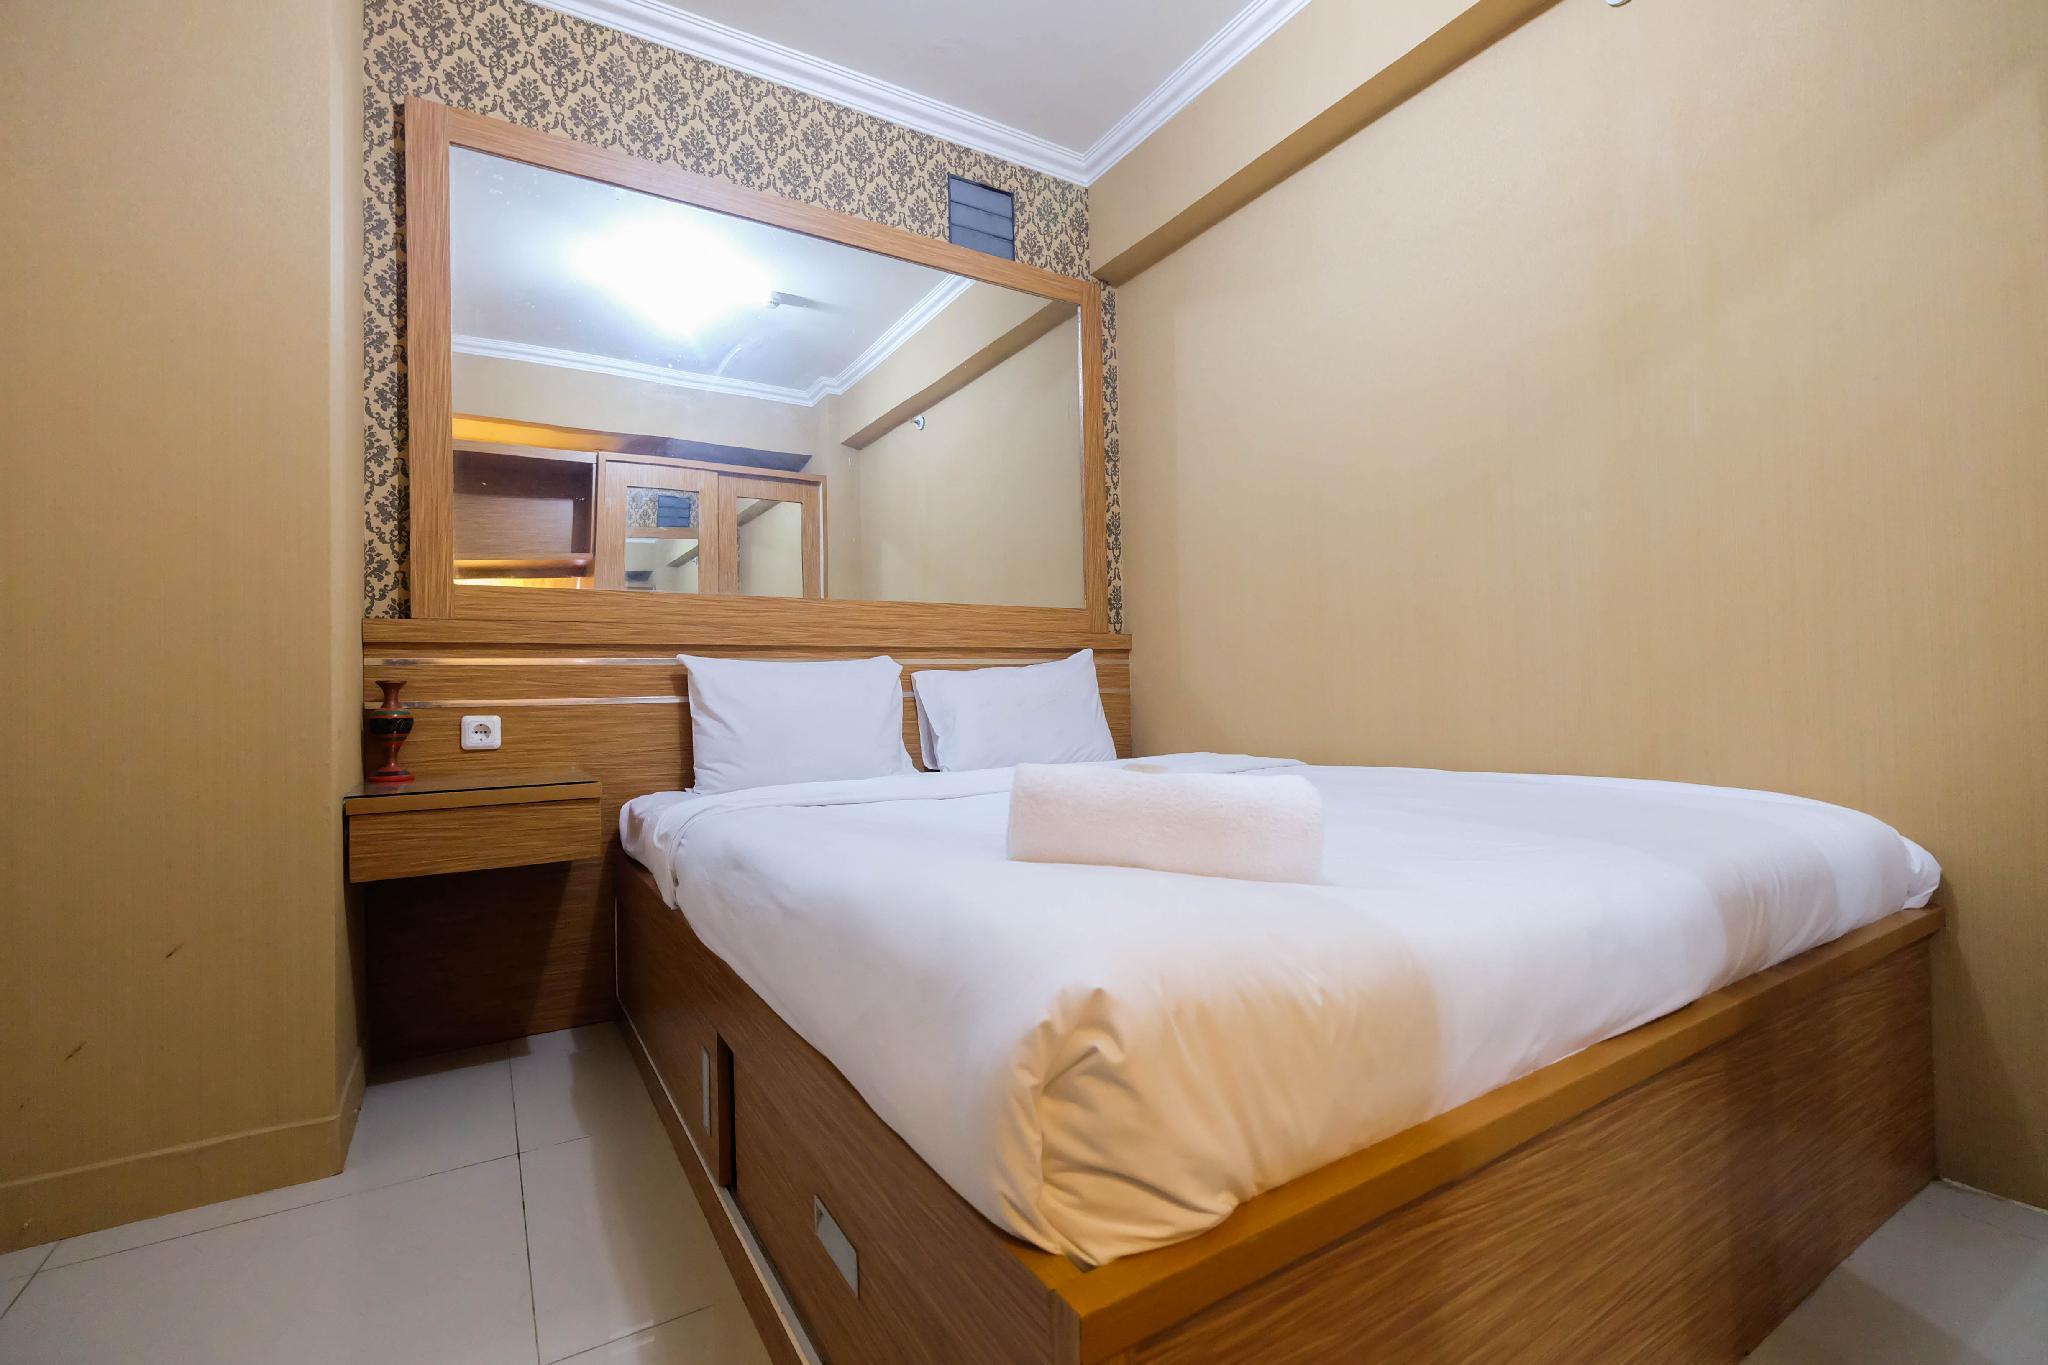 Cozy Stay 2BR @Green Pramuka Apartment By Travelio